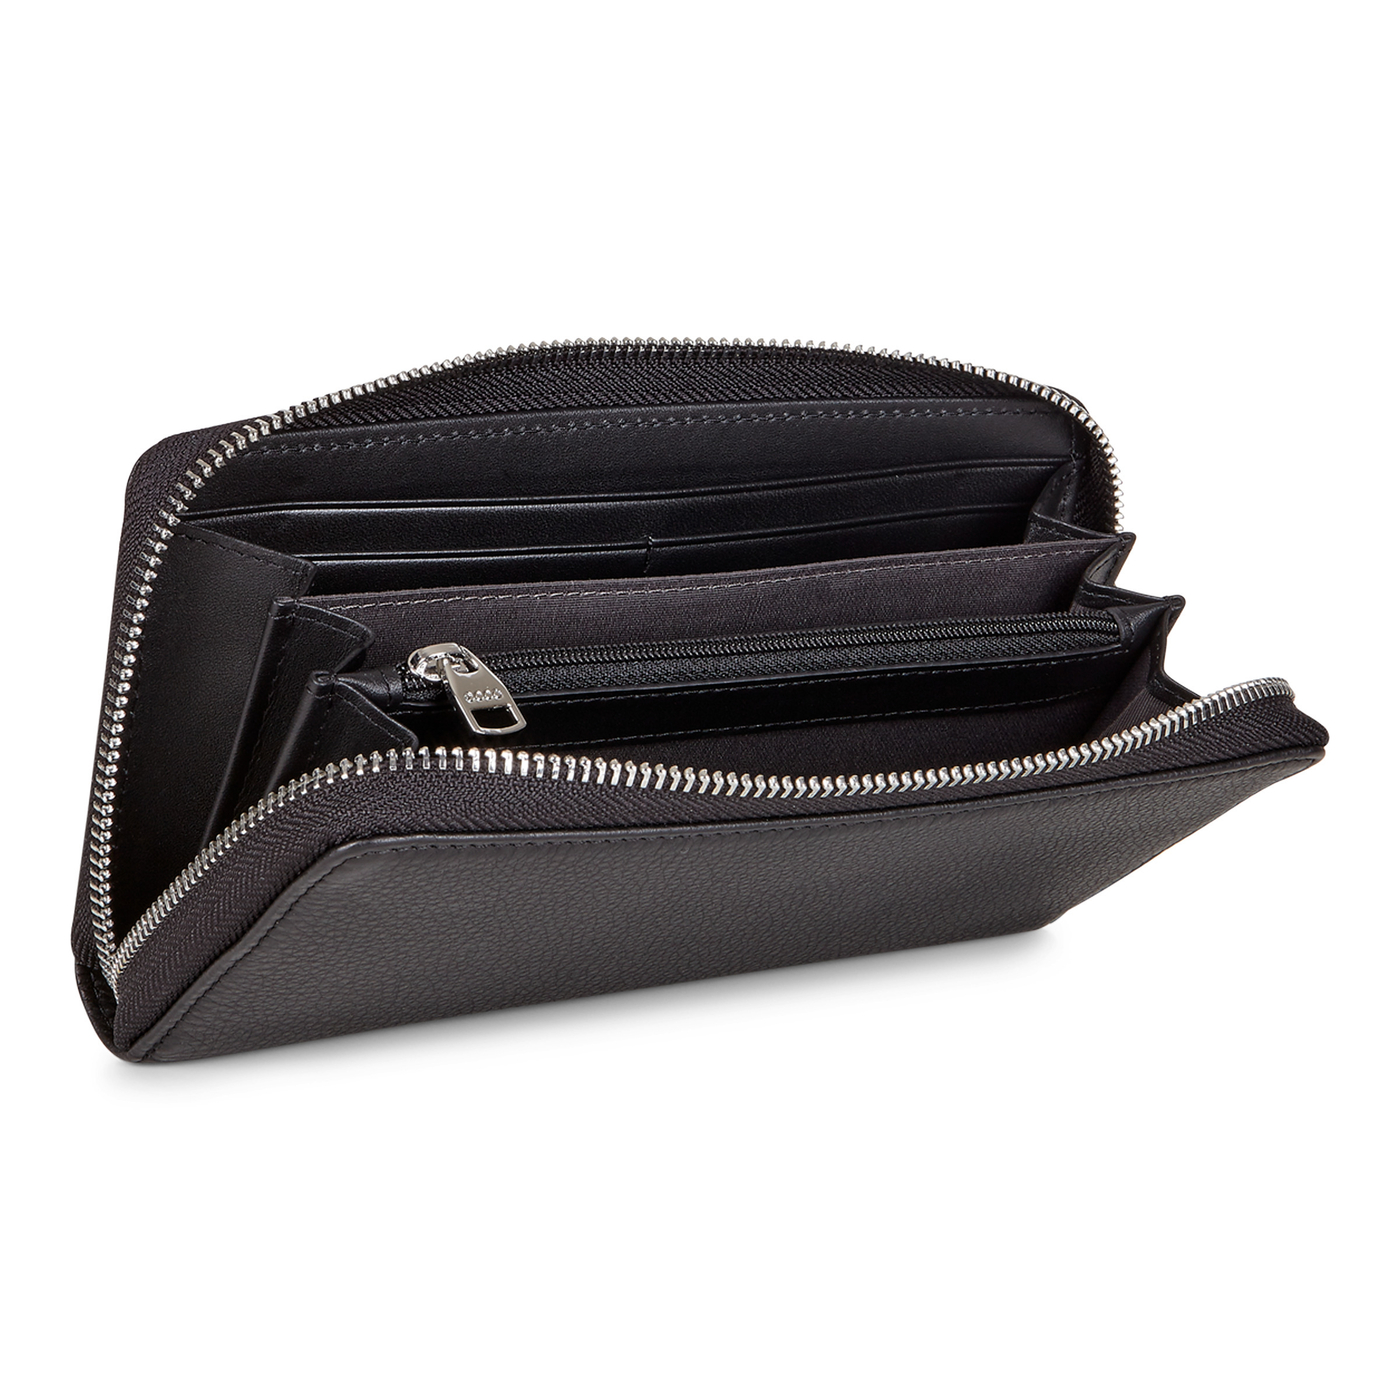 ECCO JOS Large Zip Wallet